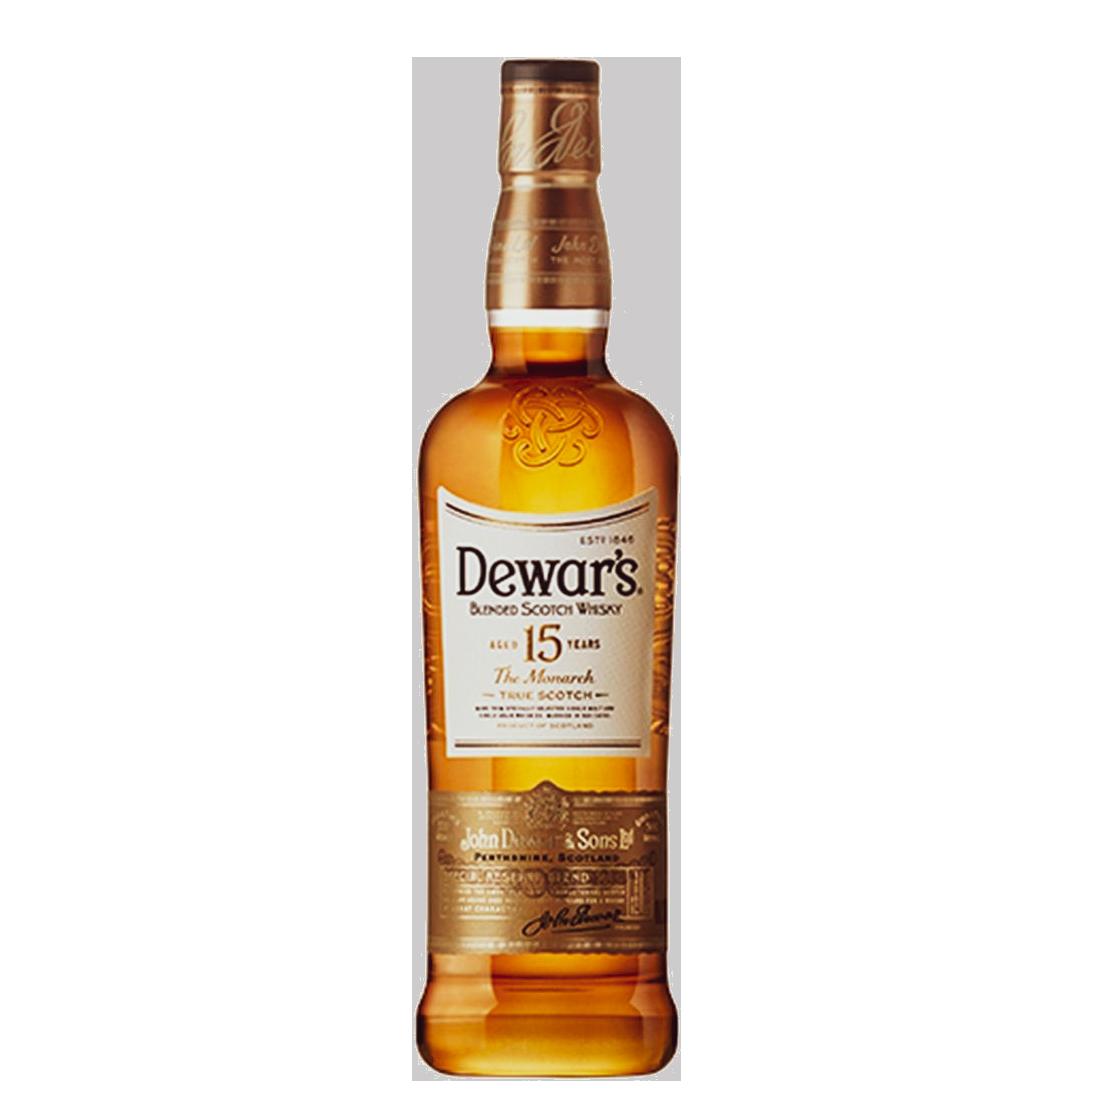 Dewars 15 Year Old Blended Scotch